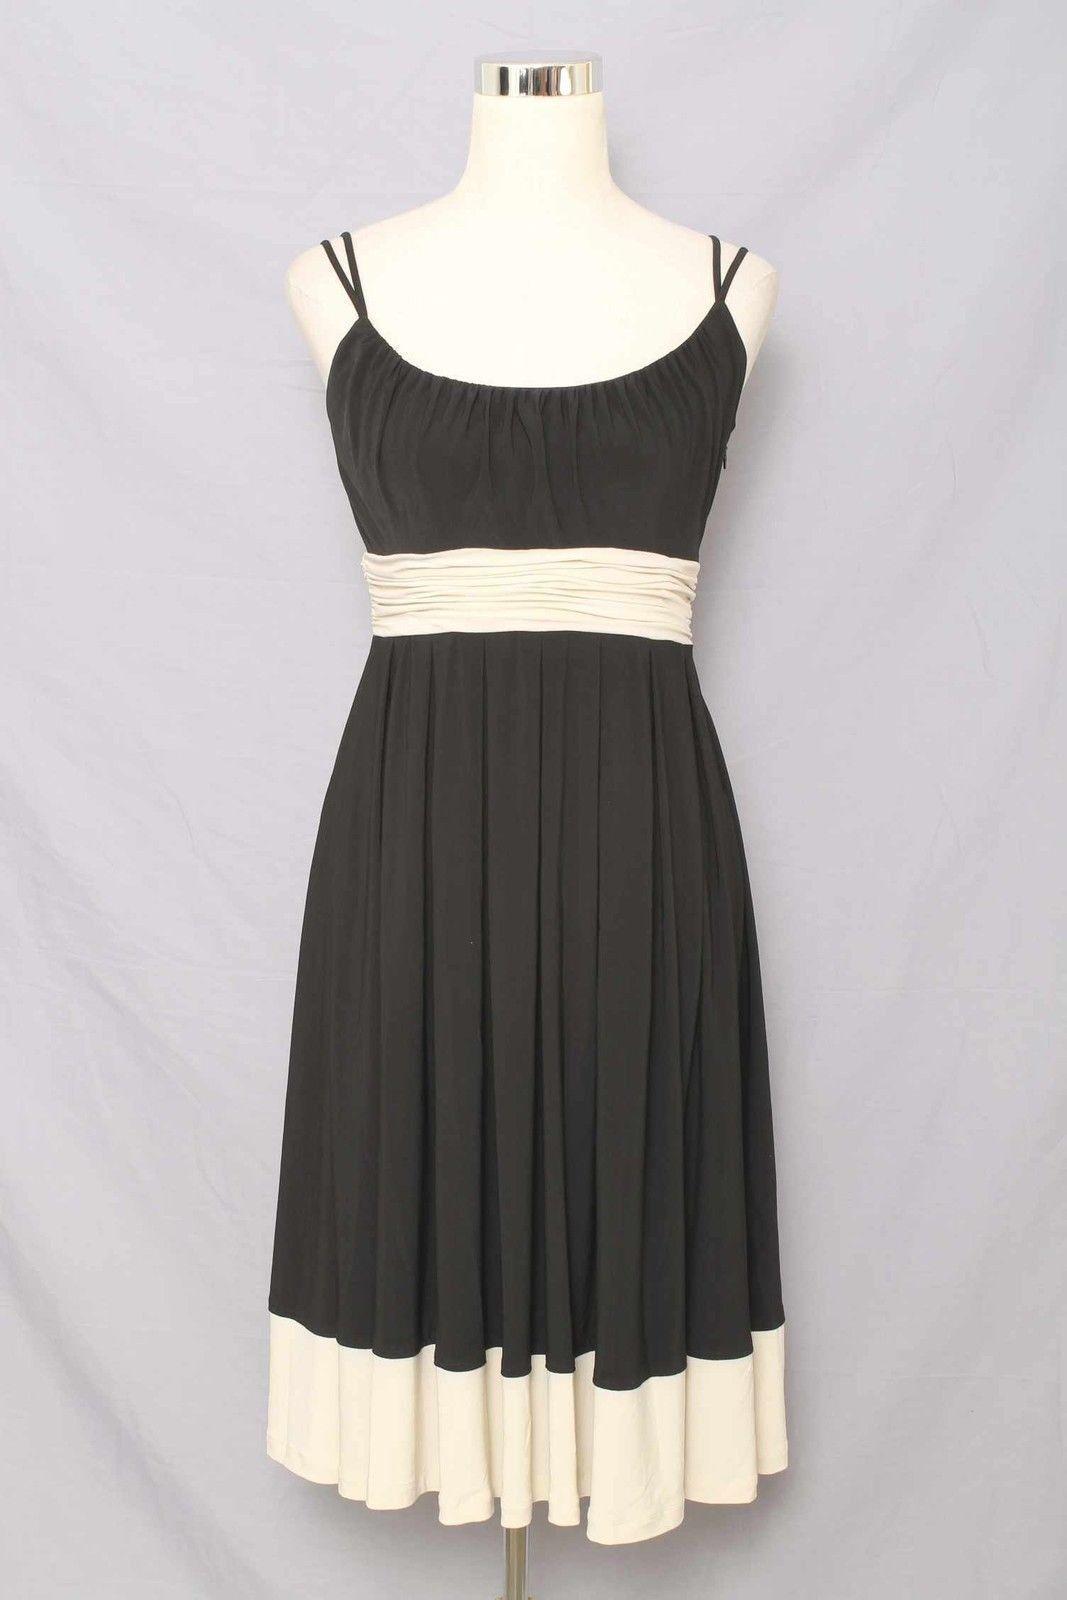 Jones New York Dress Gorgeous Black & Light Beige Dress Size 4 999 L415